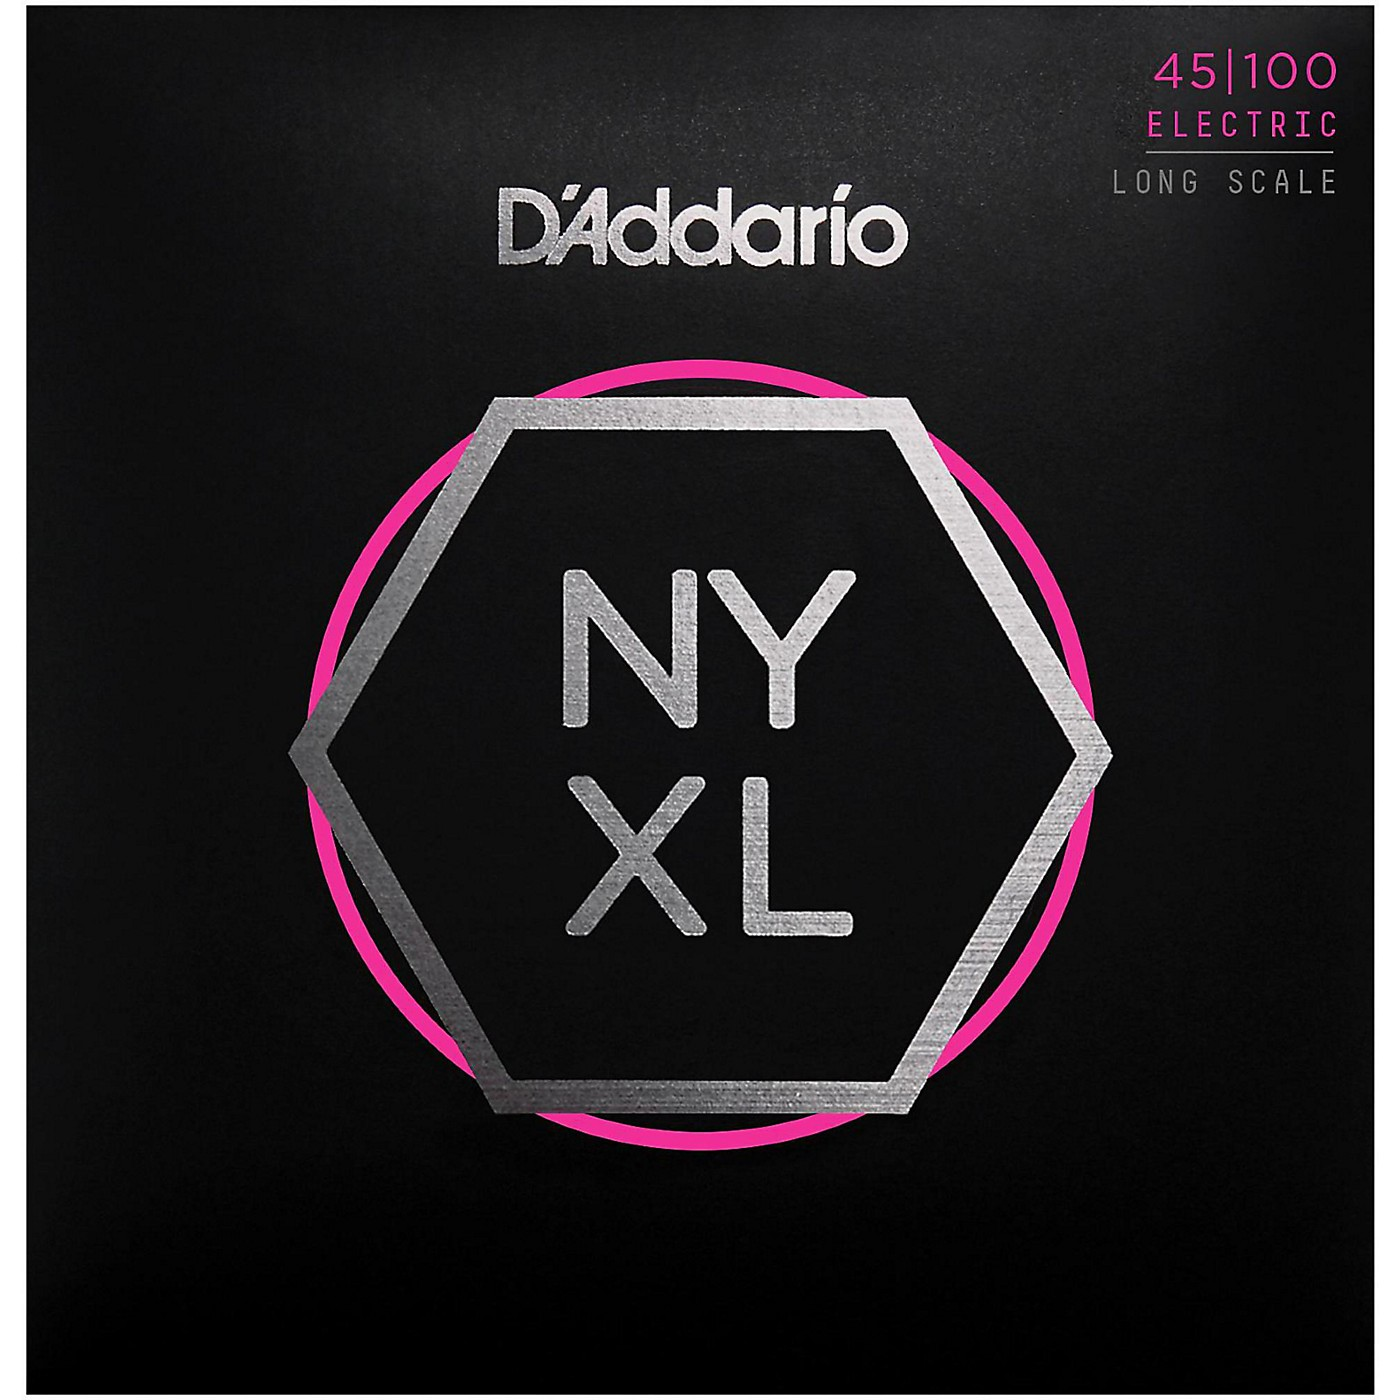 D'Addario NYXL45100 Gauge NPS Long-Scale Bass Strings thumbnail